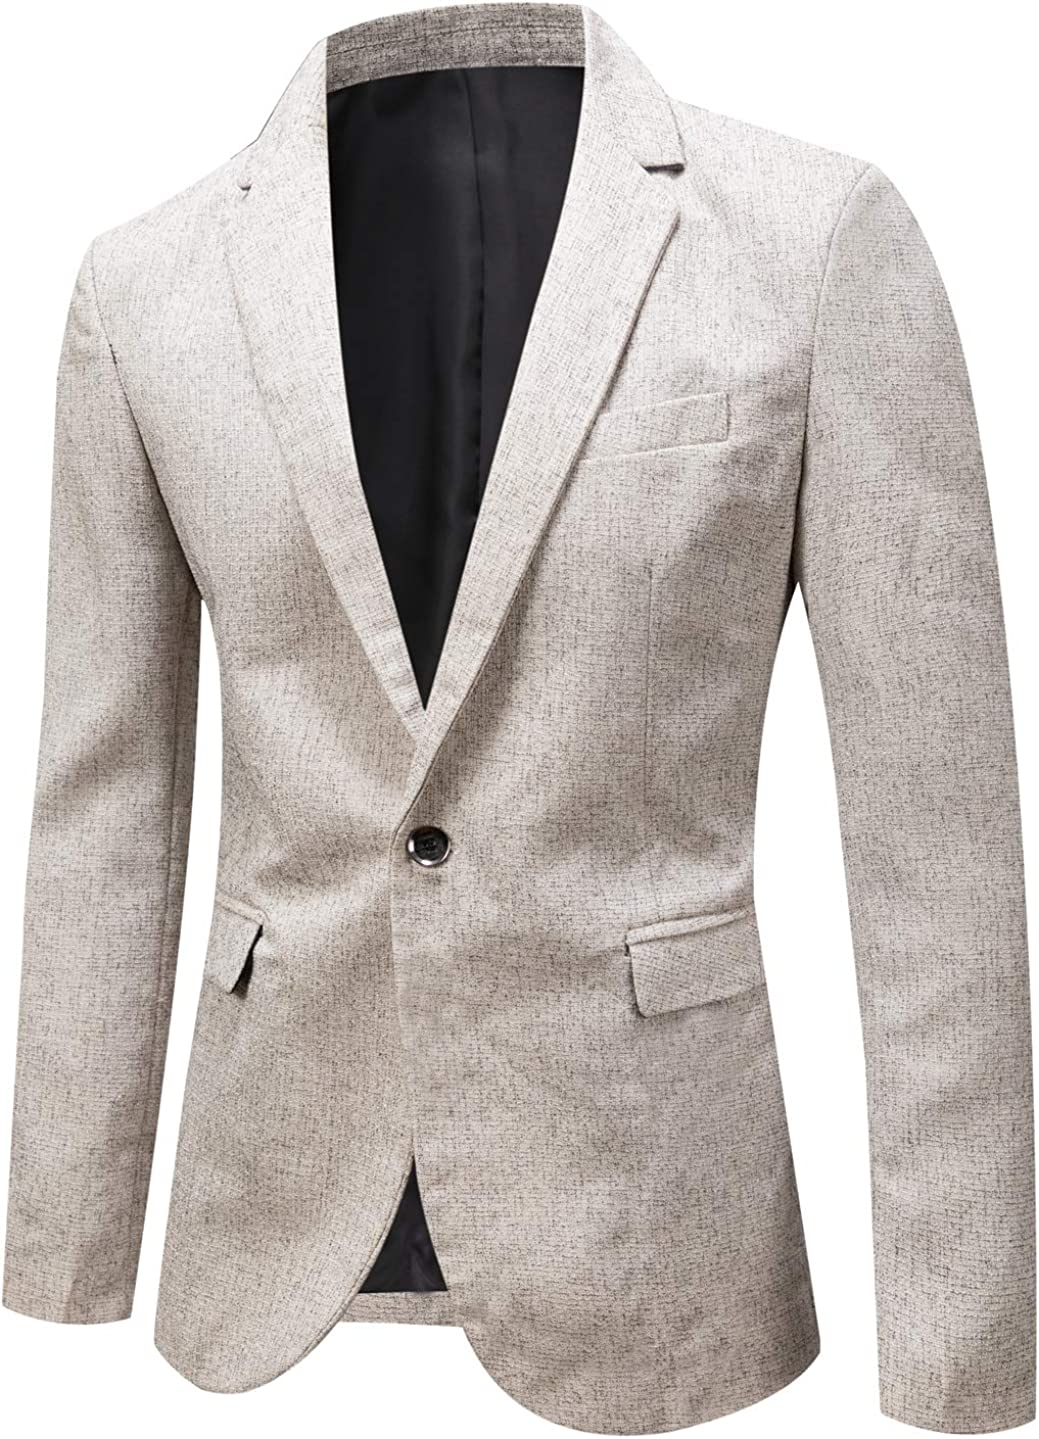 chouyatou Men's Casual Lightweight Striped One Button Slim Sports Coat Suit Jacket